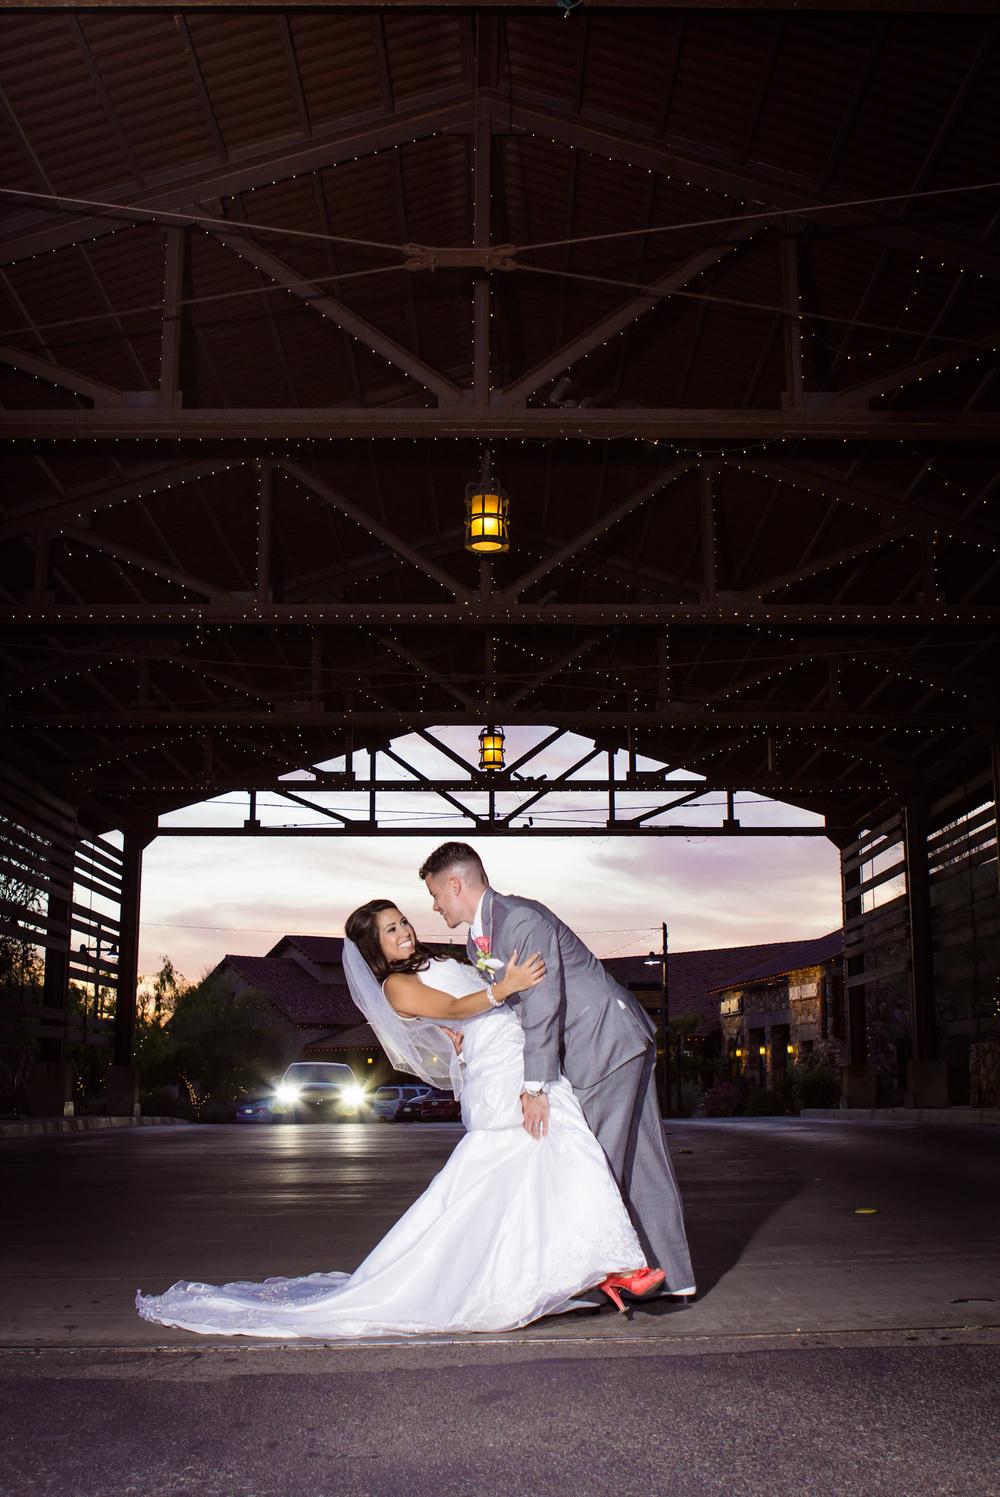 DavidOrrPhotography_Weddings_Regale_013.jpg